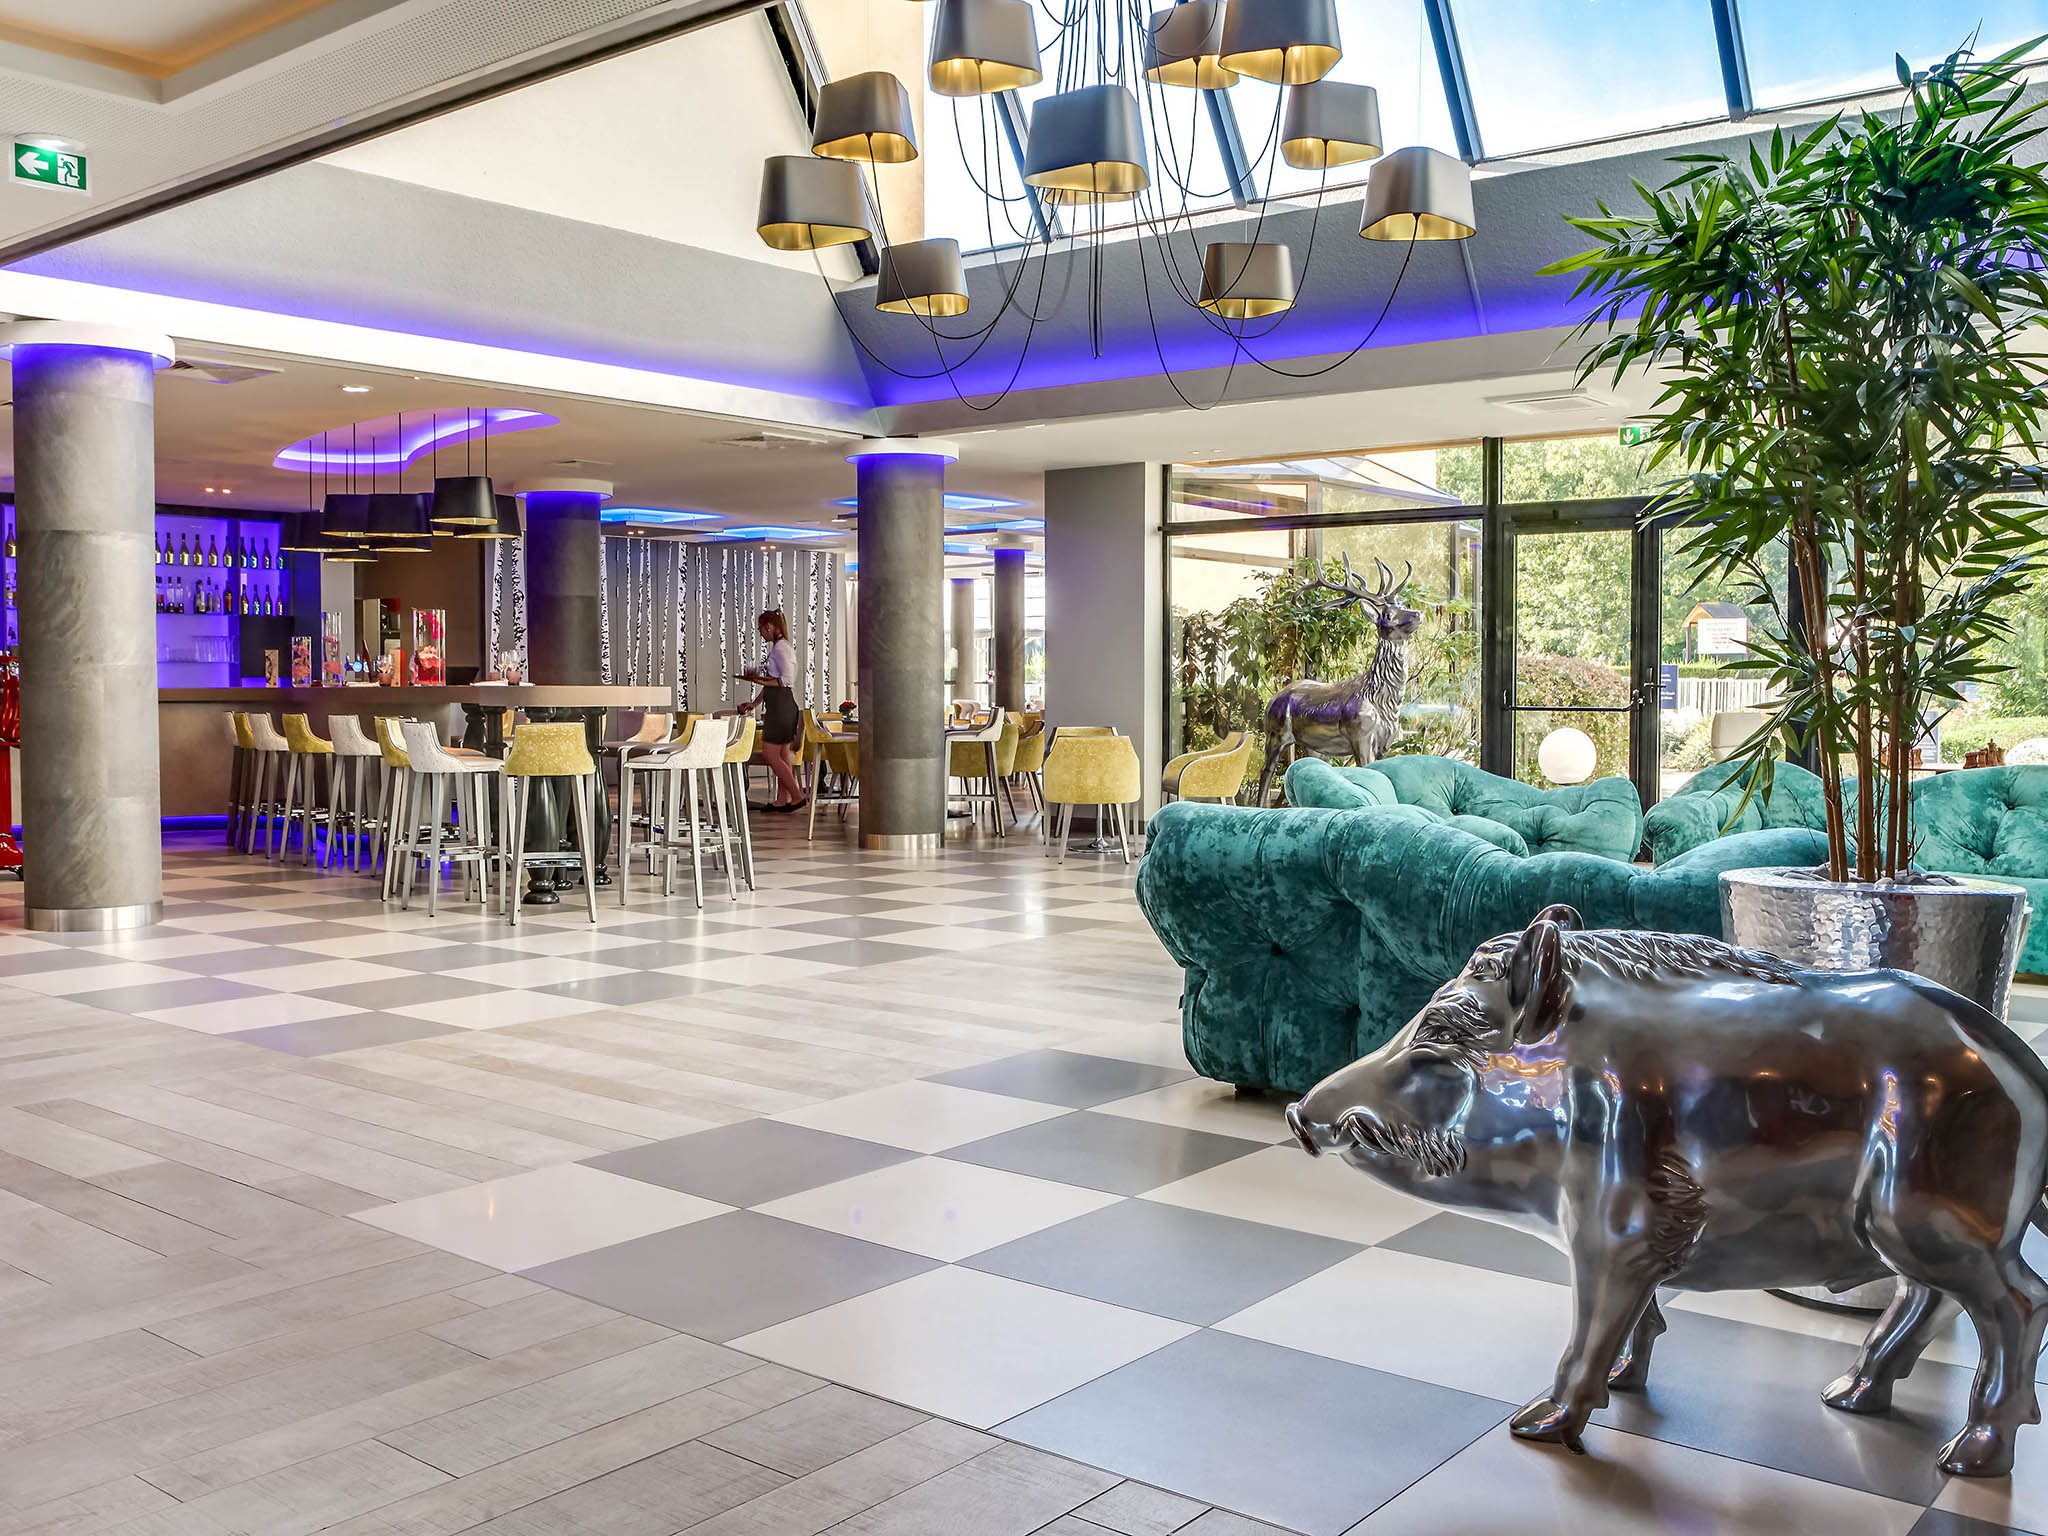 Hotel – Novotel Orléans Saint-Jean-de-Braye